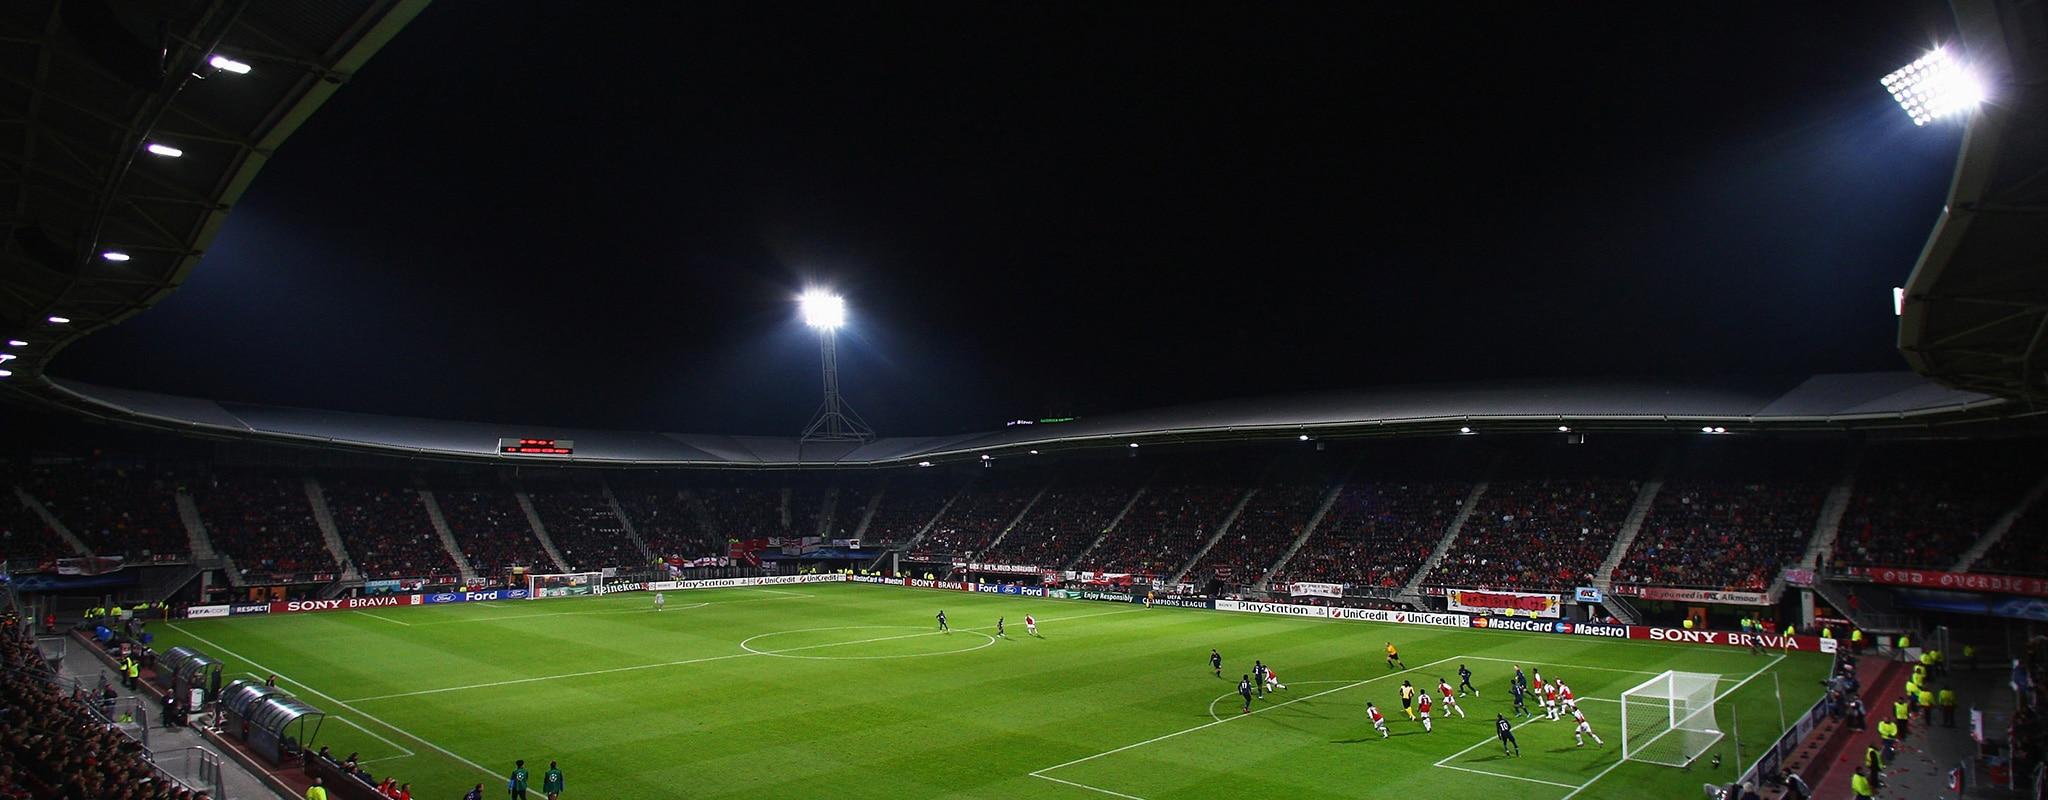 https://img.uefa.com/imgml/stadium/uw/92804.jpg